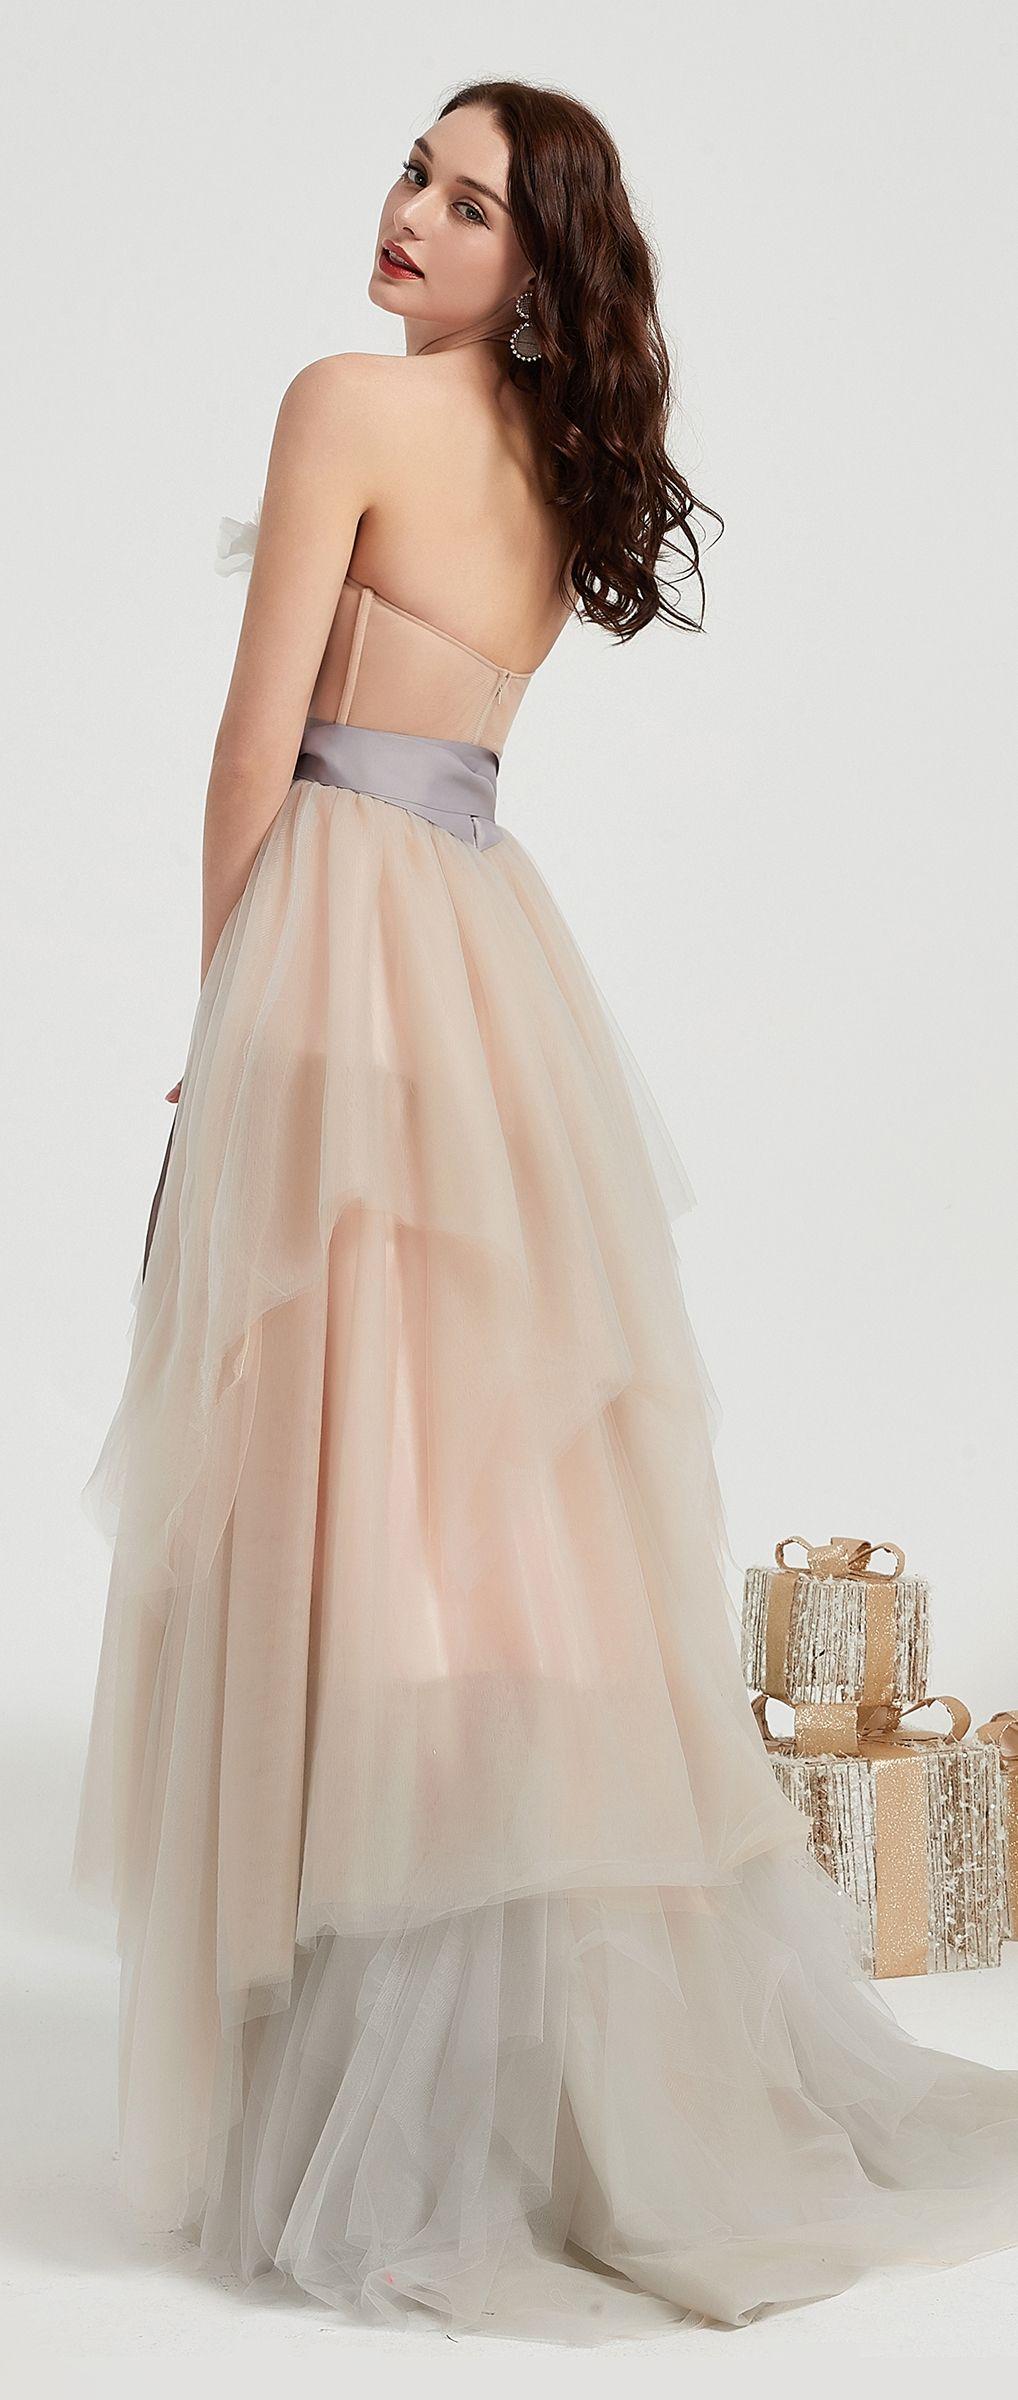 New Ruffle Corset Elegant Long Tulle Party Evening Dress